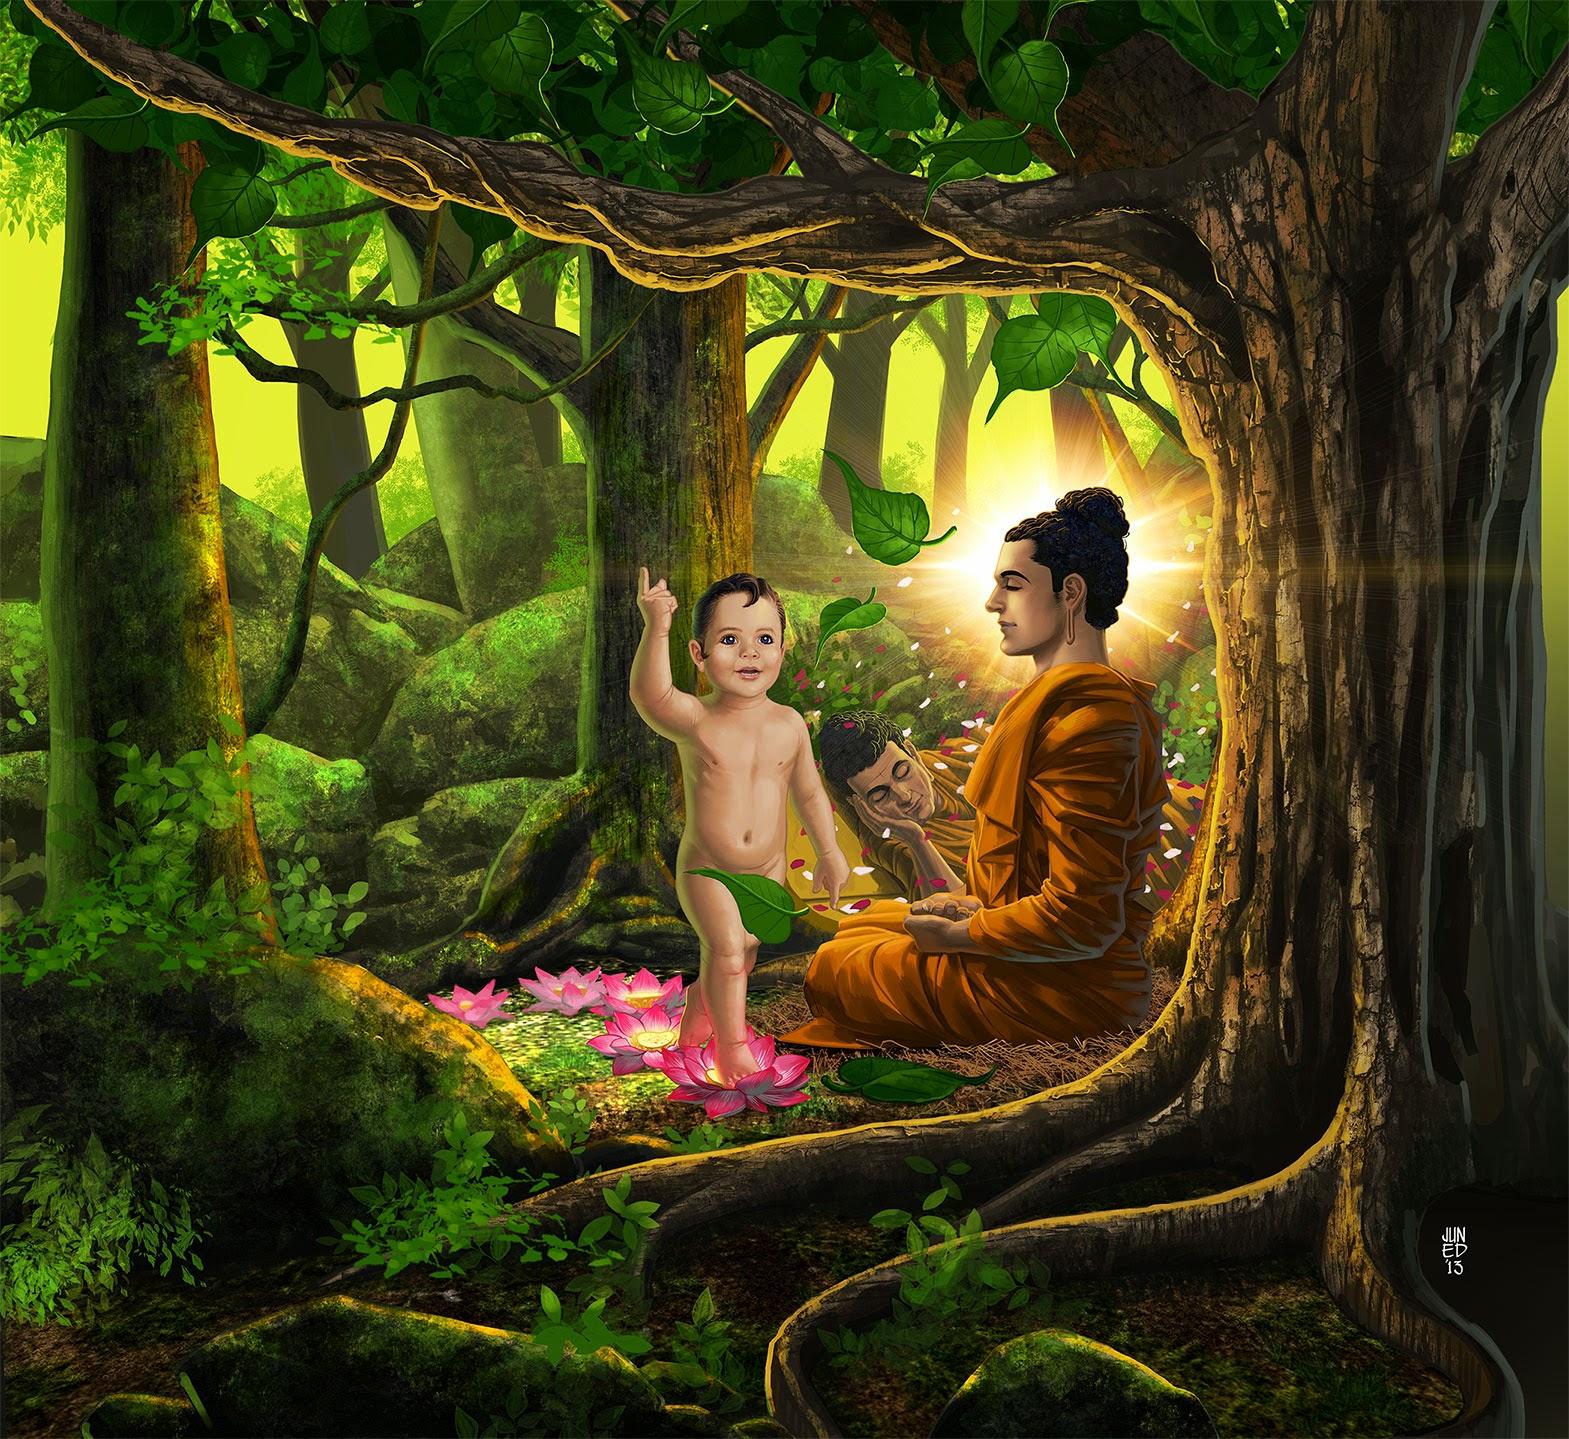 siddhartha essay enlightenment Siddhartha essay - let the top  april 10th grader will soon find enlightenment essays looking for siddhartha ch4 free study guide essay essay meaning meditation.